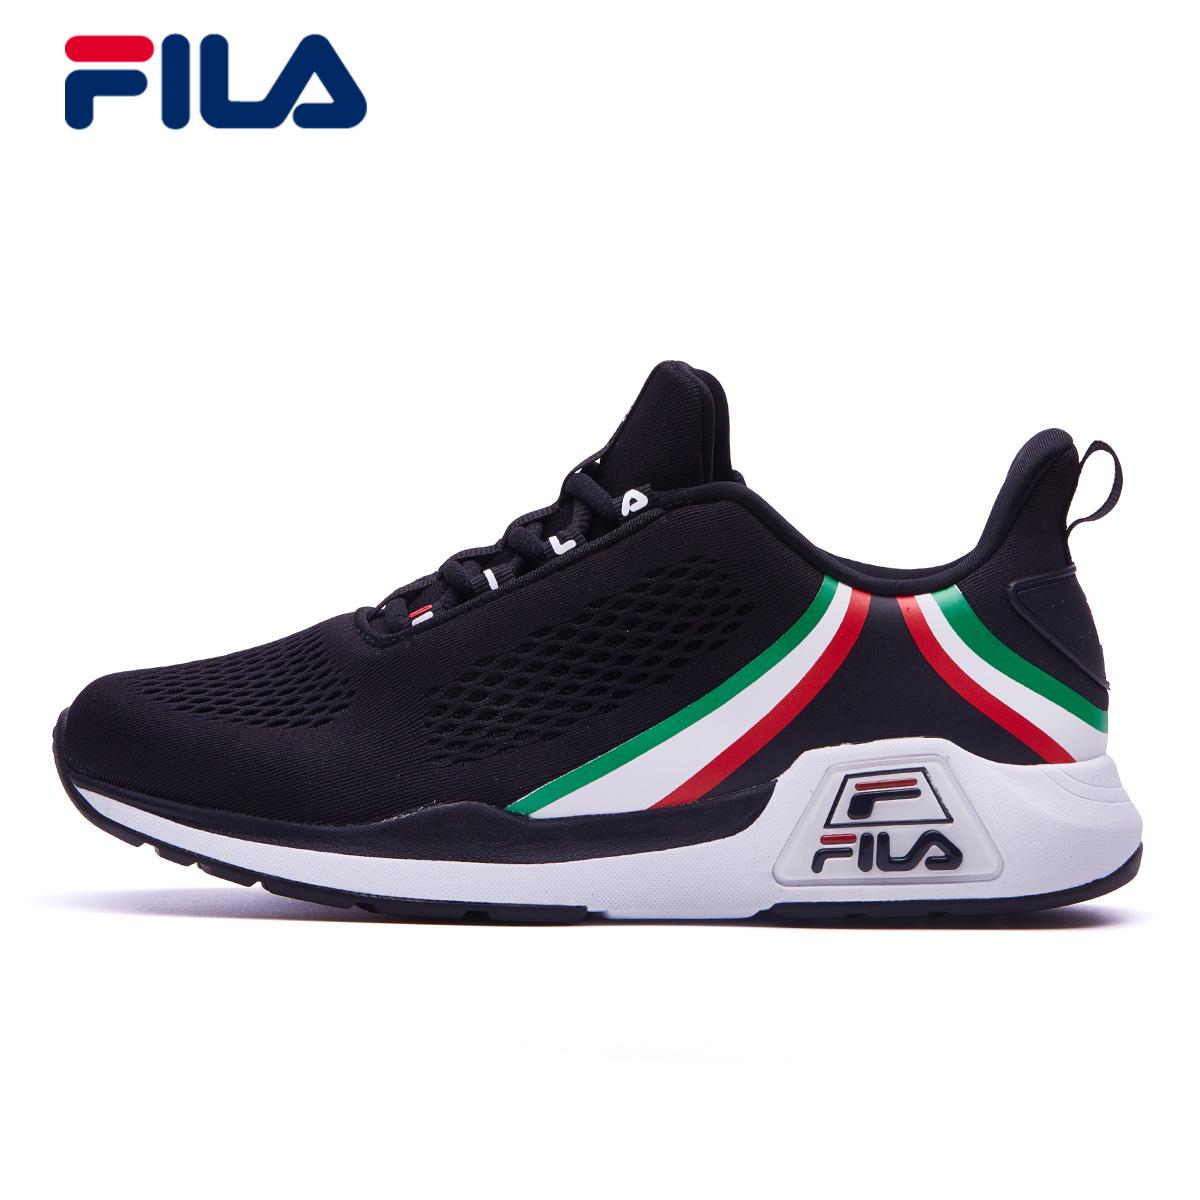 Usd 20589 Fila Fei Music Shoes 2018 Autumn New Full Version